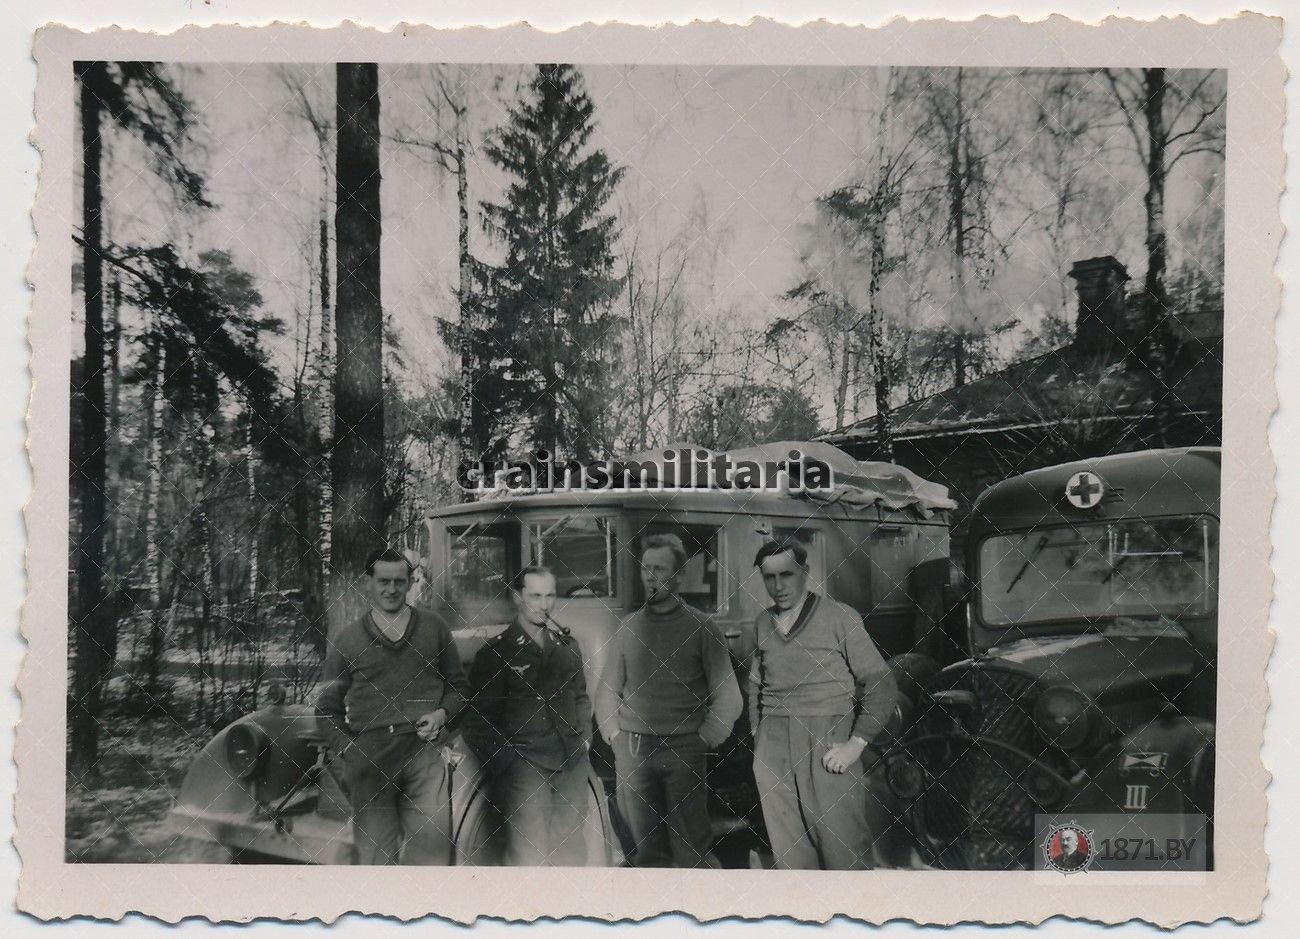 Санитарная служба, вермахт, Барановичи